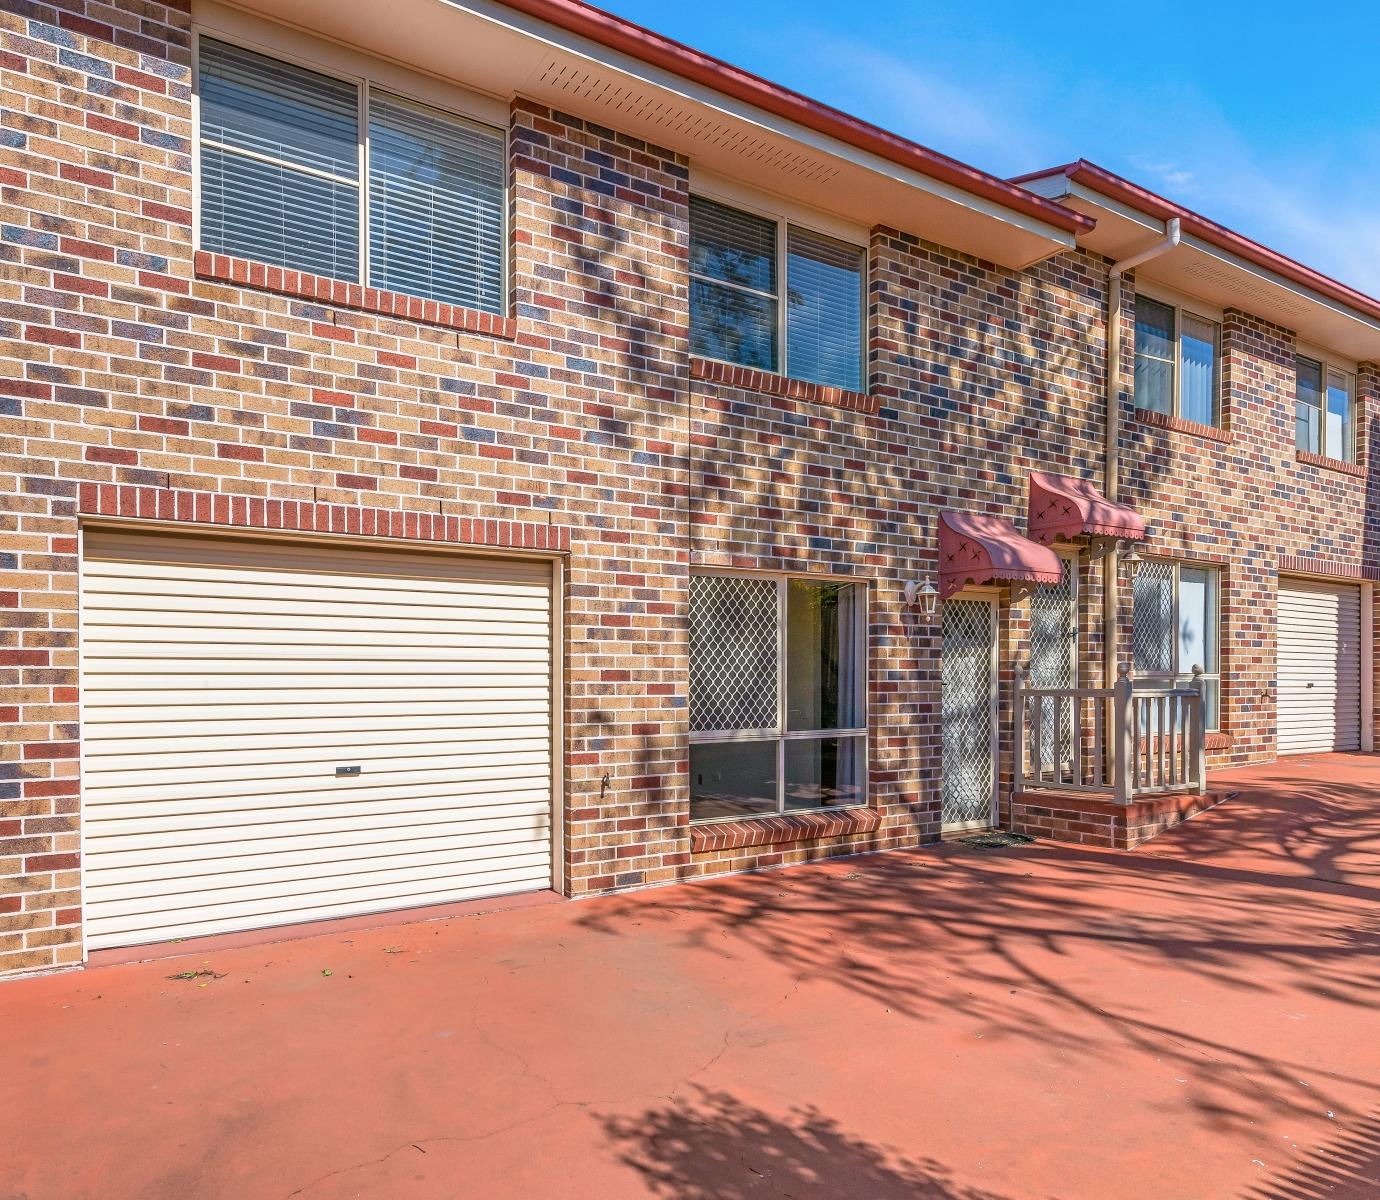 H Street Apartments: 4/33 Helen Street, Newtown QLD 4350